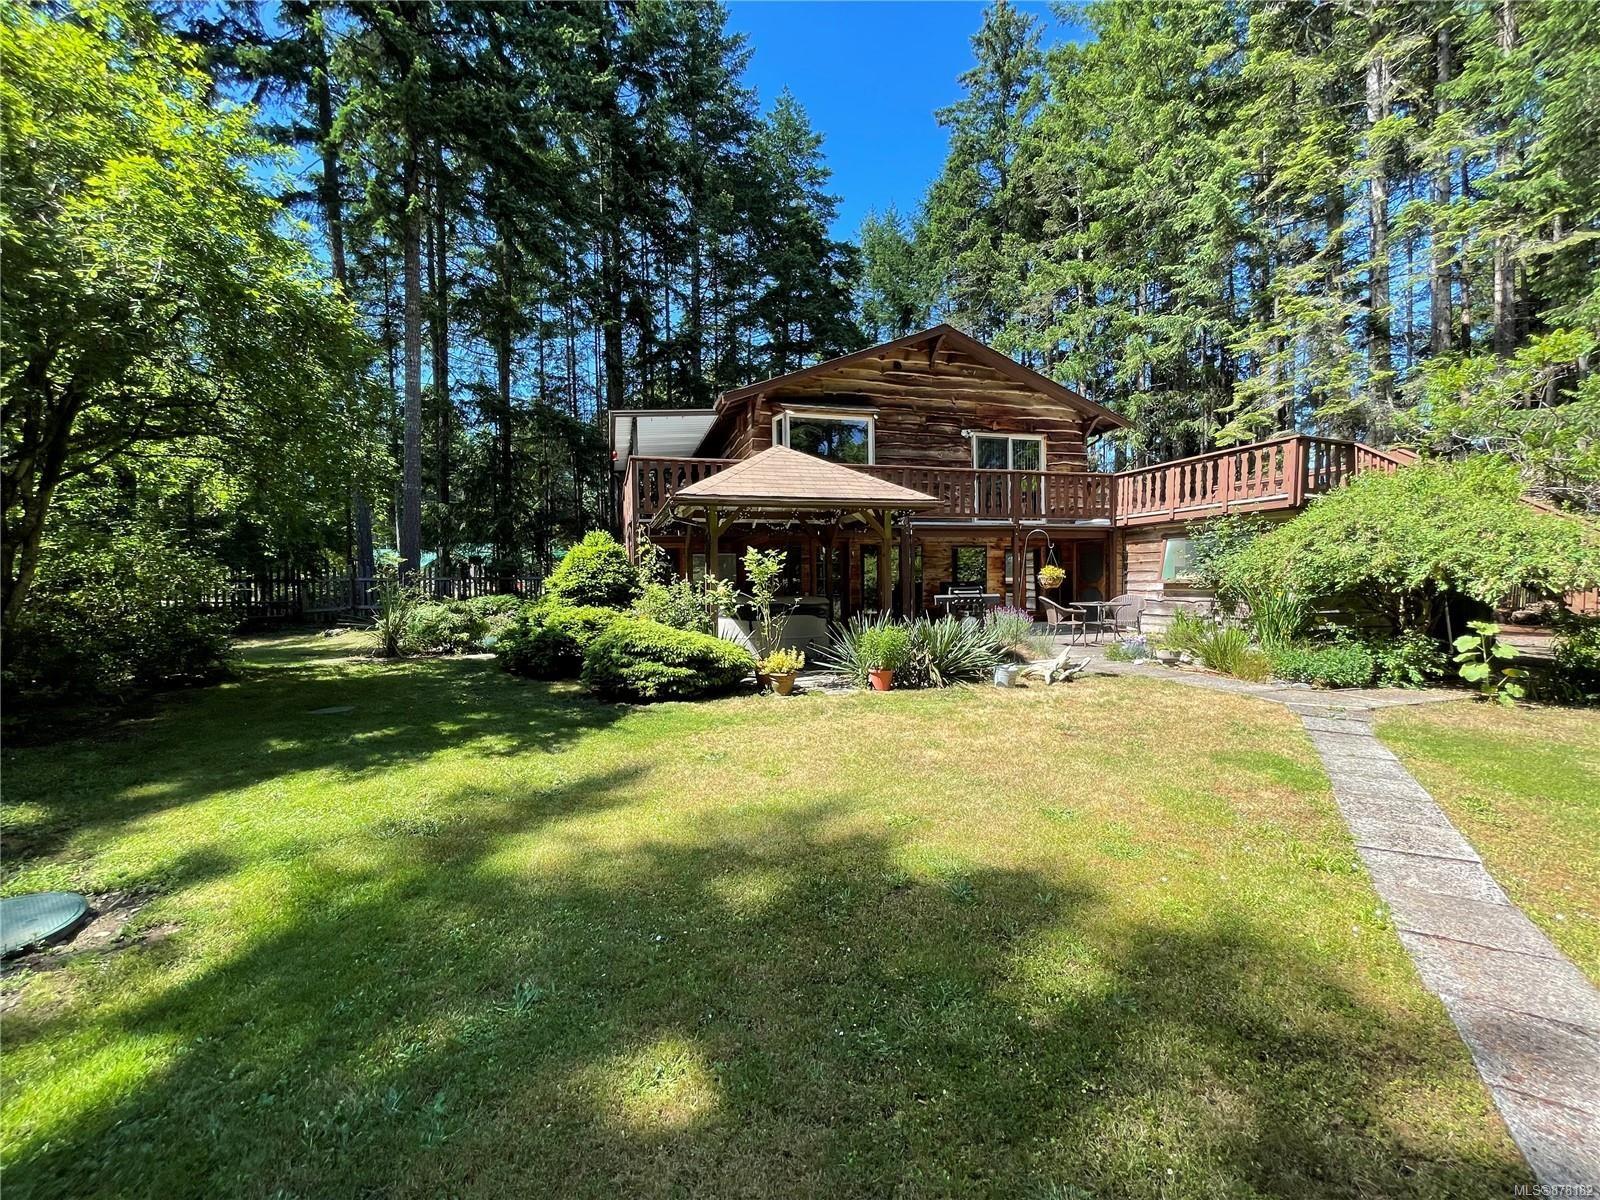 Main Photo: 826 Buttercup Rd in : Isl Gabriola Island House for sale (Islands)  : MLS®# 878182